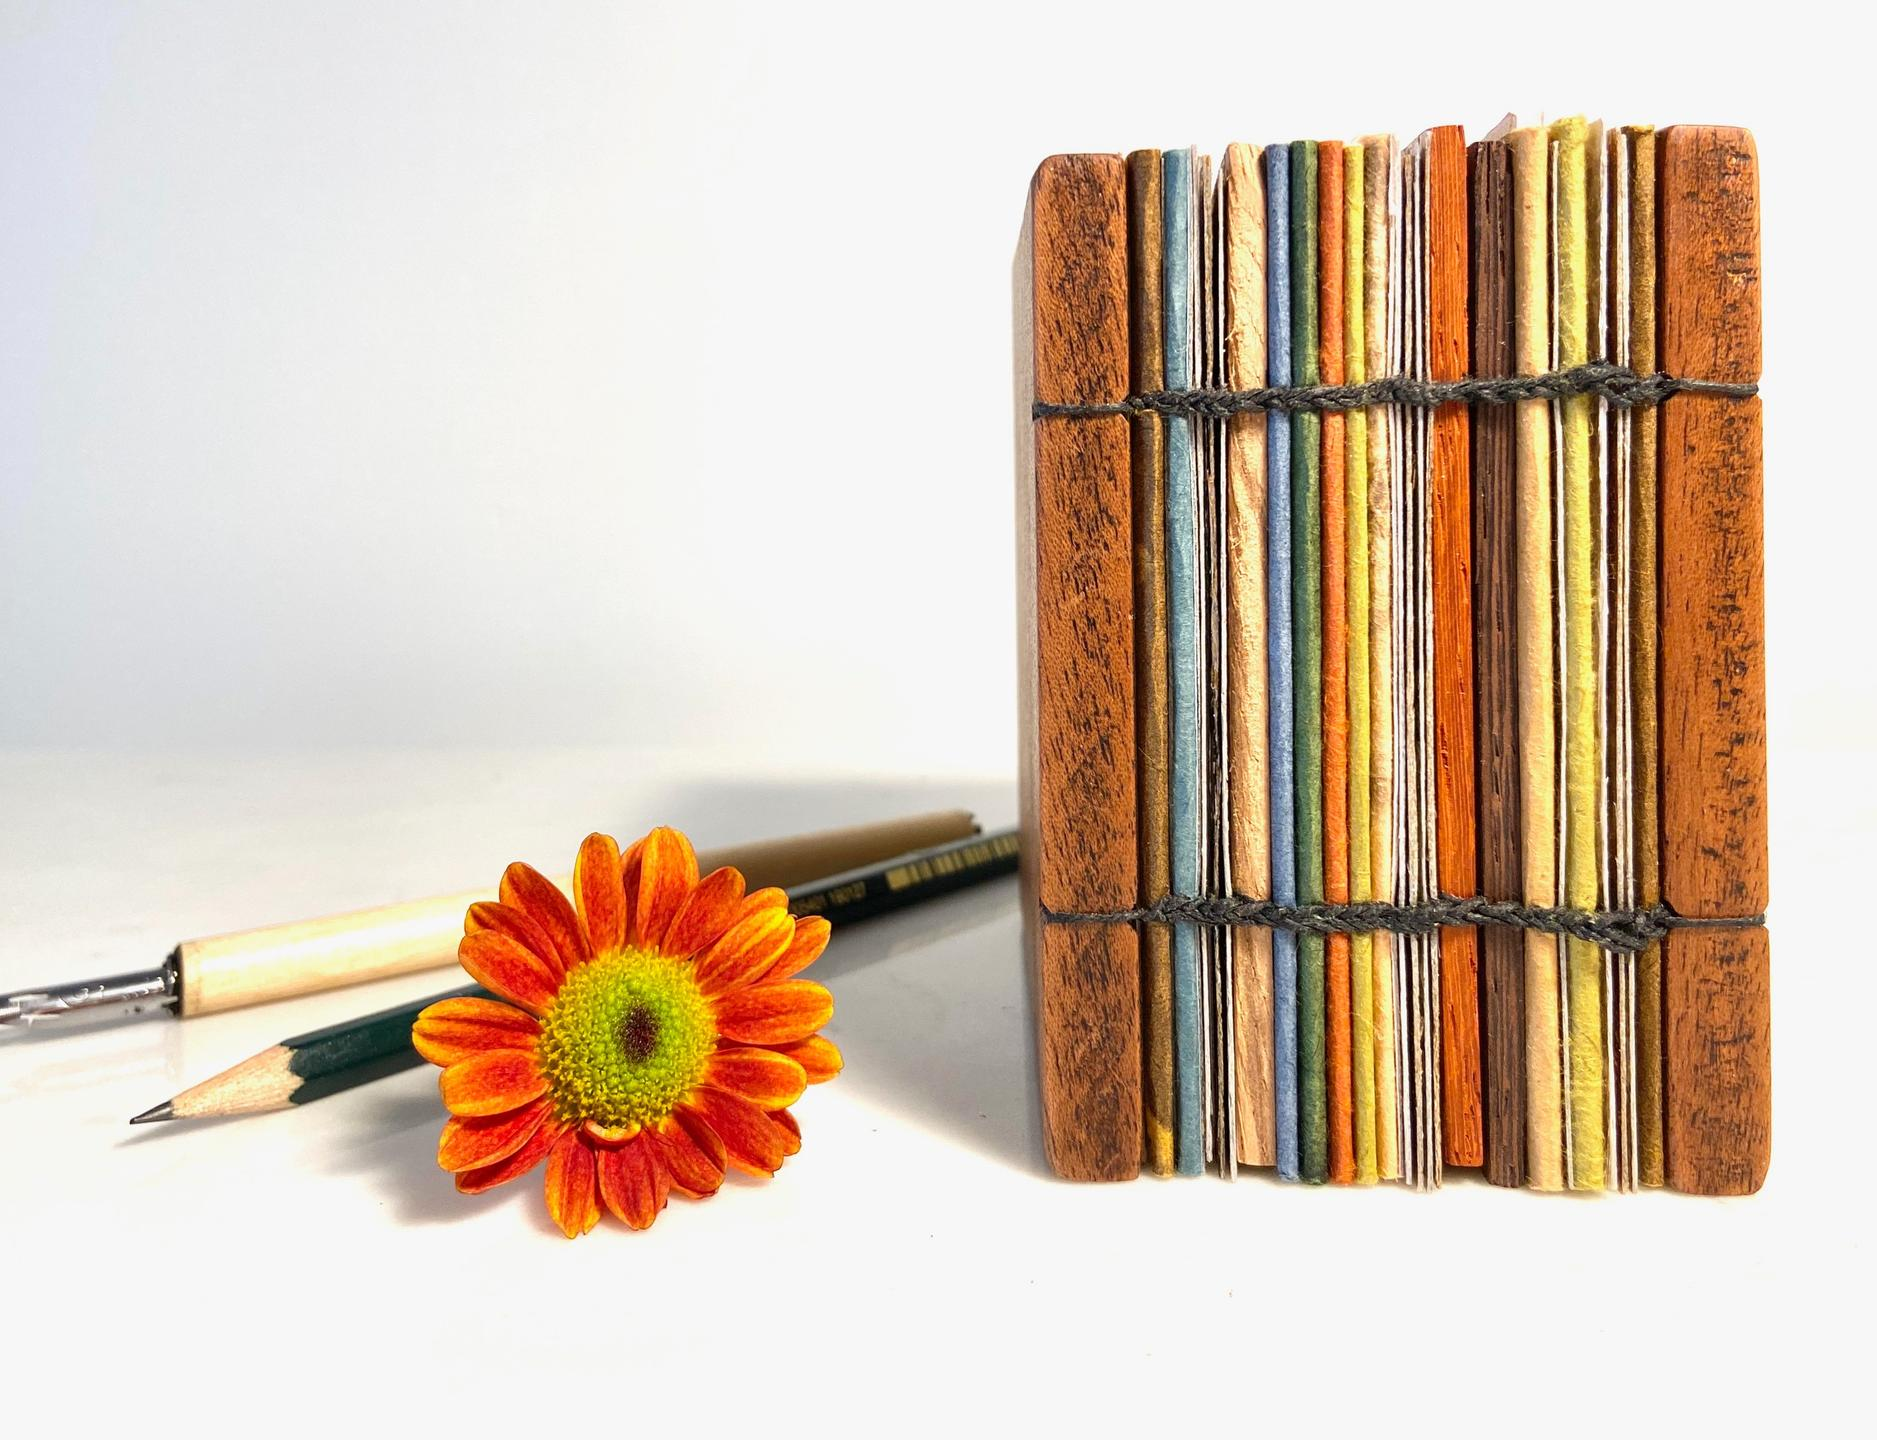 Calligraphy pen, drawing pencil, artist book with coptic binding, & orange zinnia